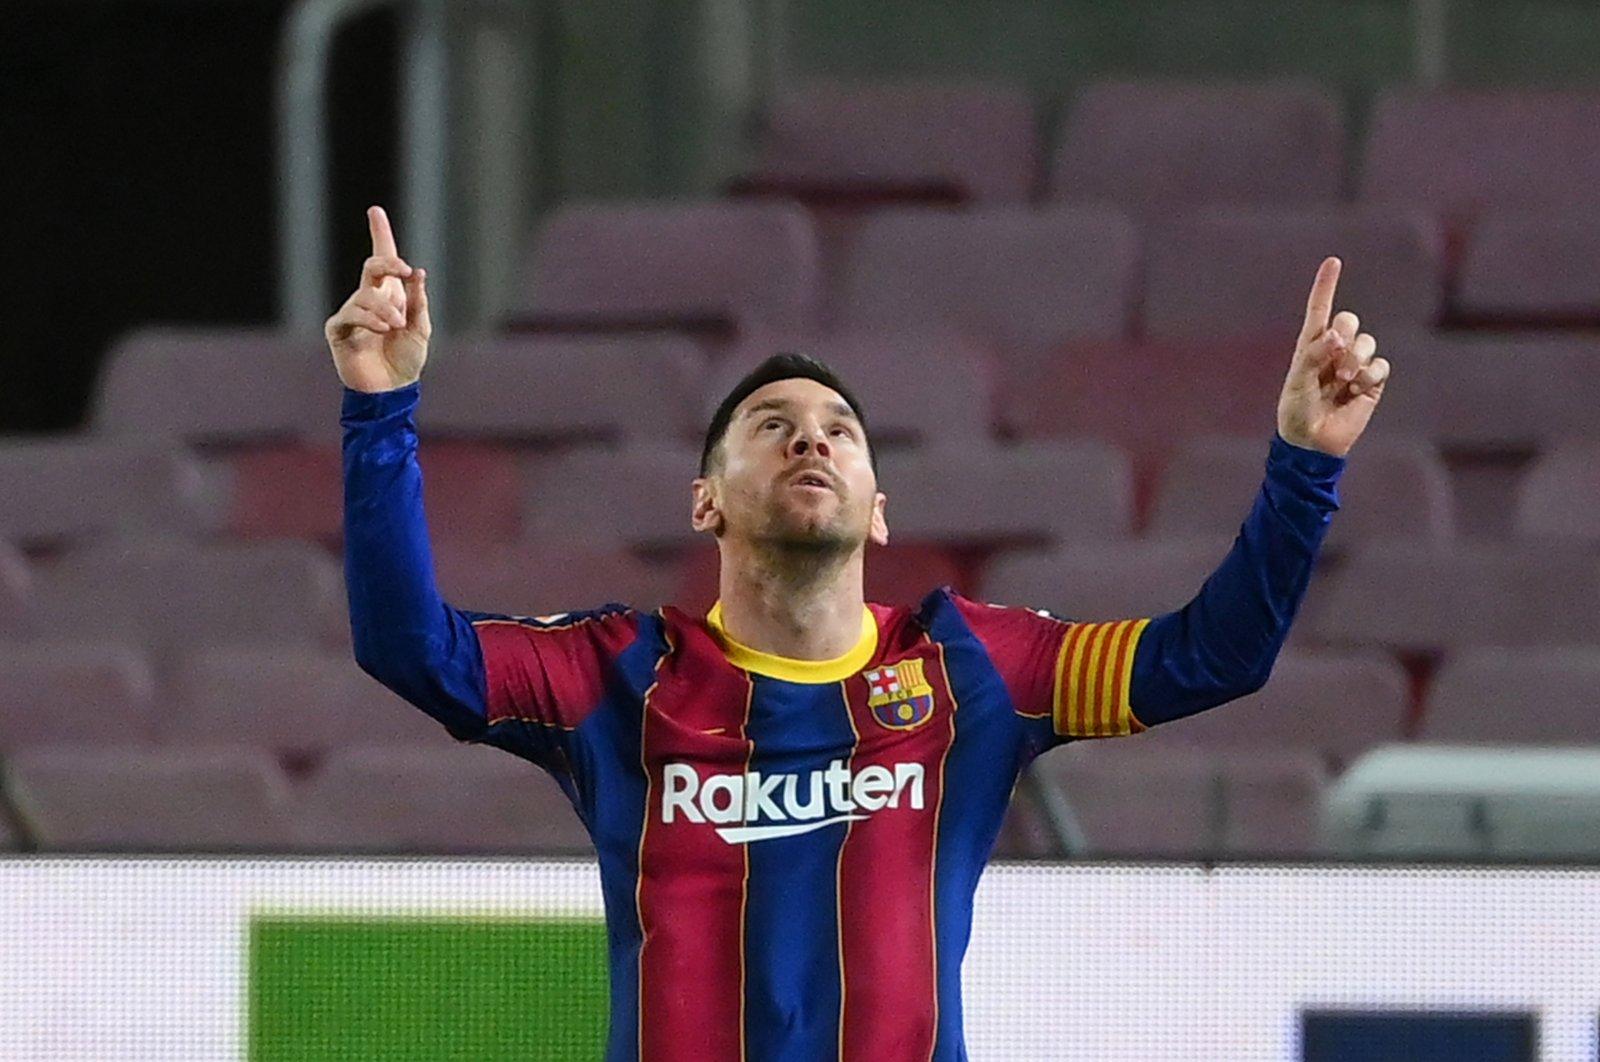 Barcelona forward Lionel Messi celebrates after scoring a goal against Athletic Club Bilbao at Camp Nou, Barcelona, Spain, Jan. 31, 2021. (AFP Photo)